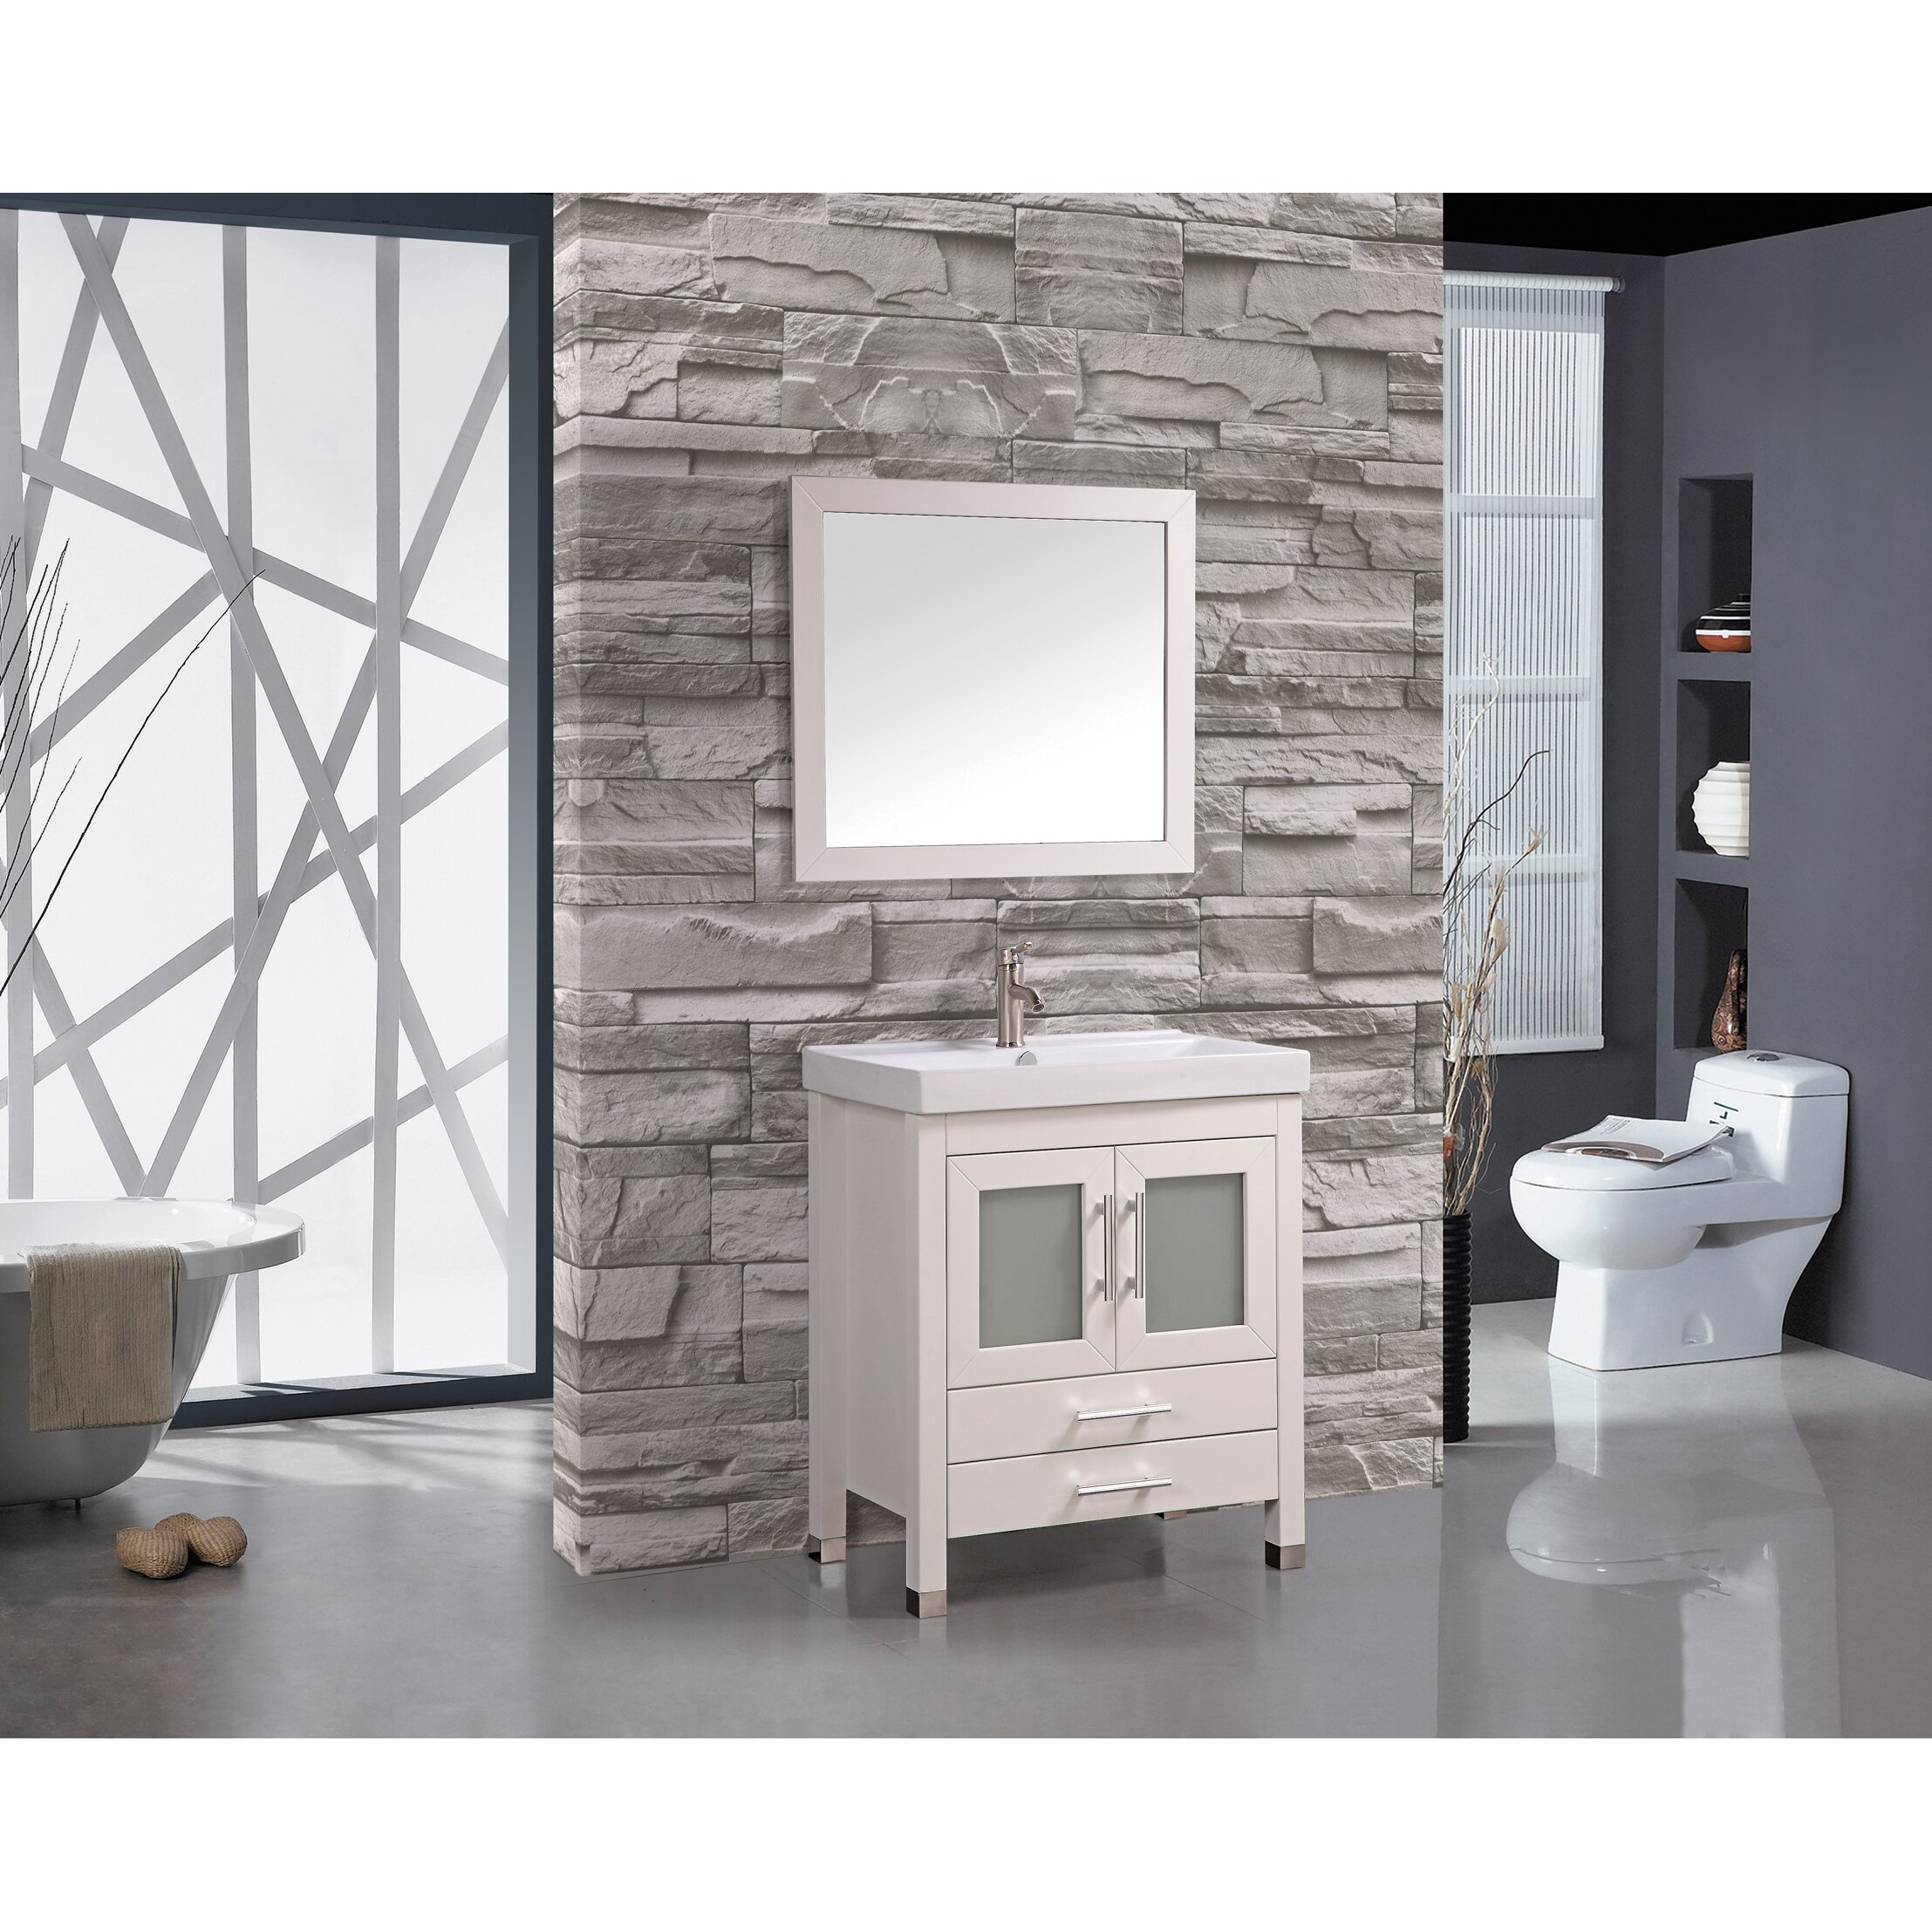 "MTDVanities Greece 30"" Single Sink Bathroom Vanity Set"